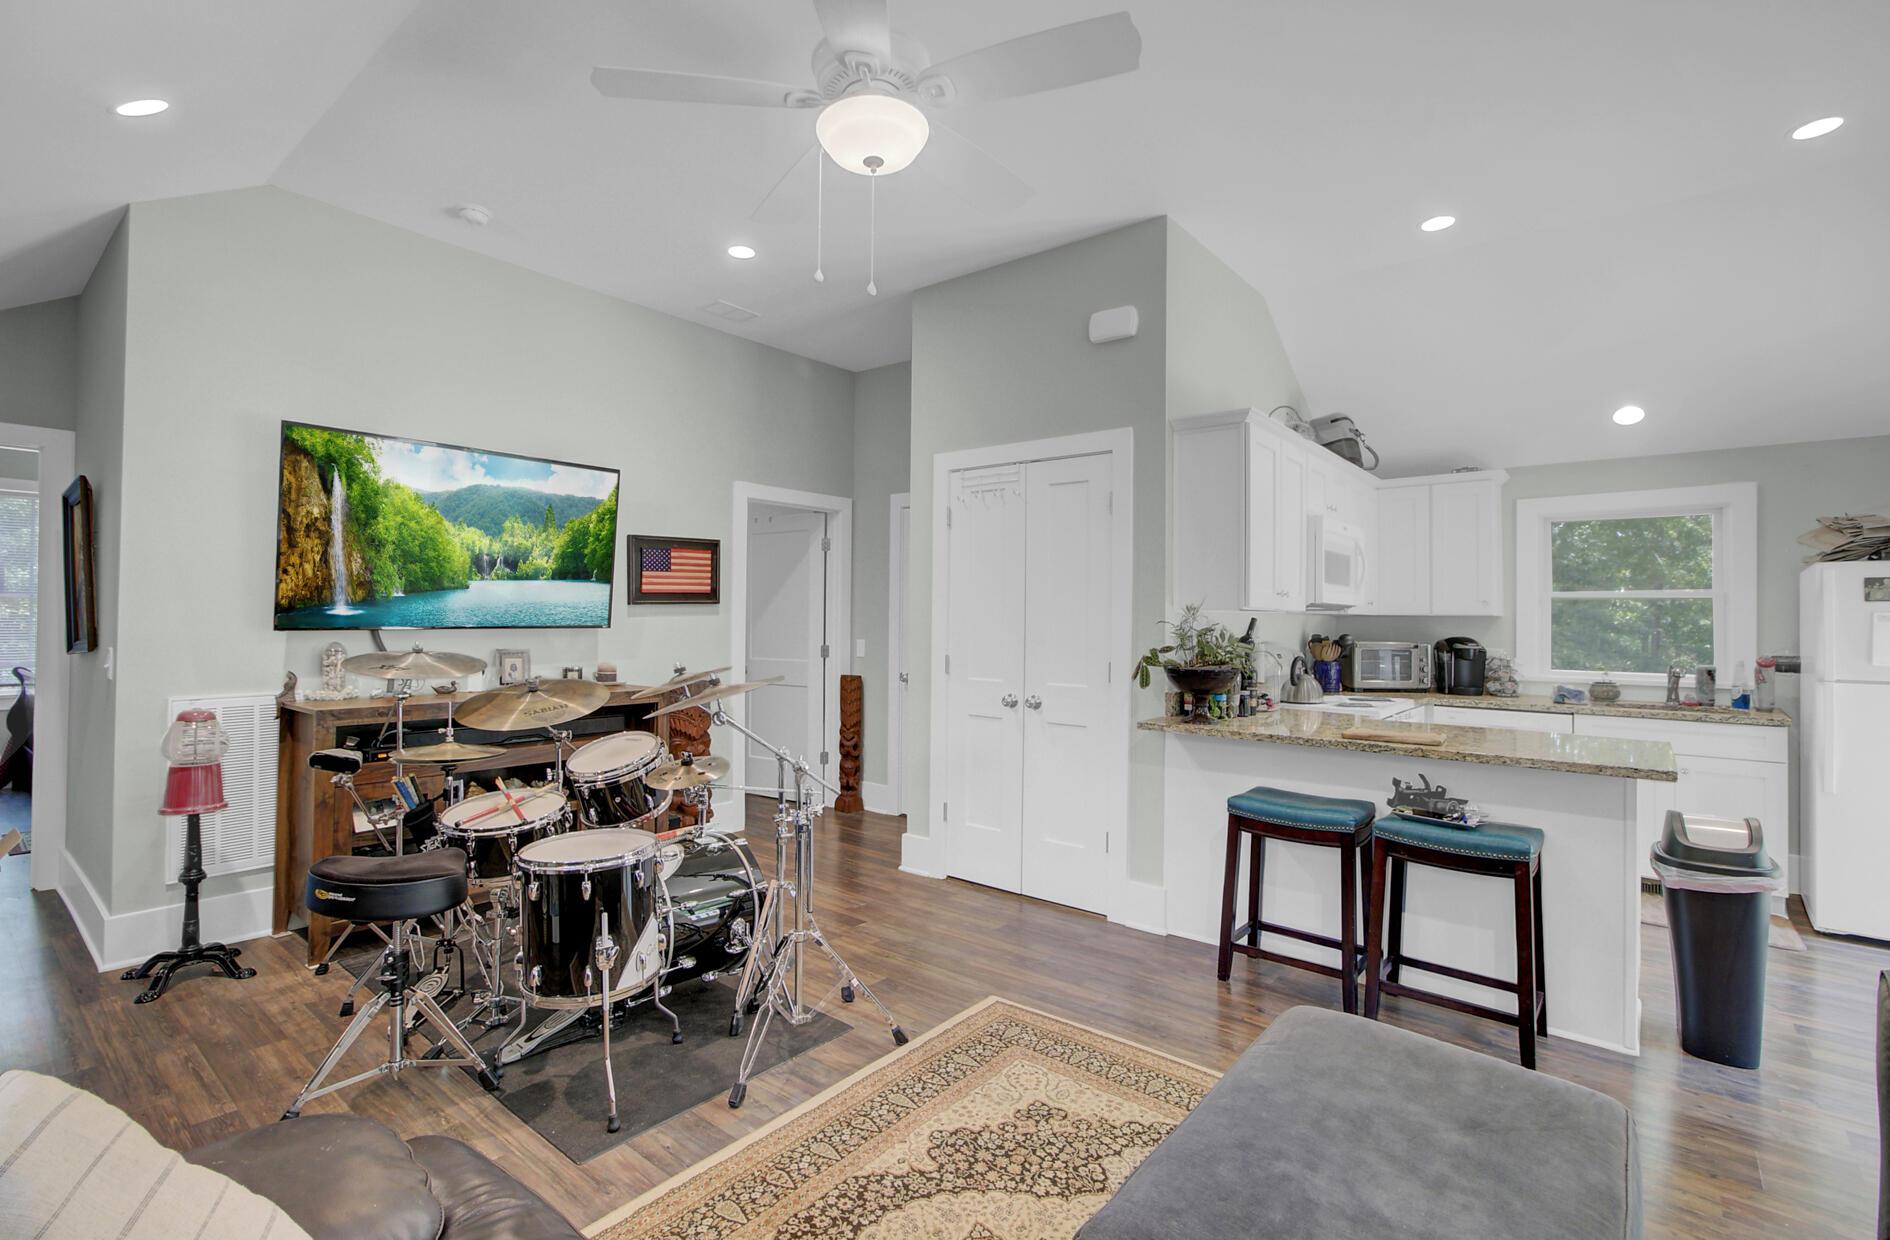 Yaugh Hall Homes For Sale - 1229 Porchers Bluff, Mount Pleasant, SC - 37